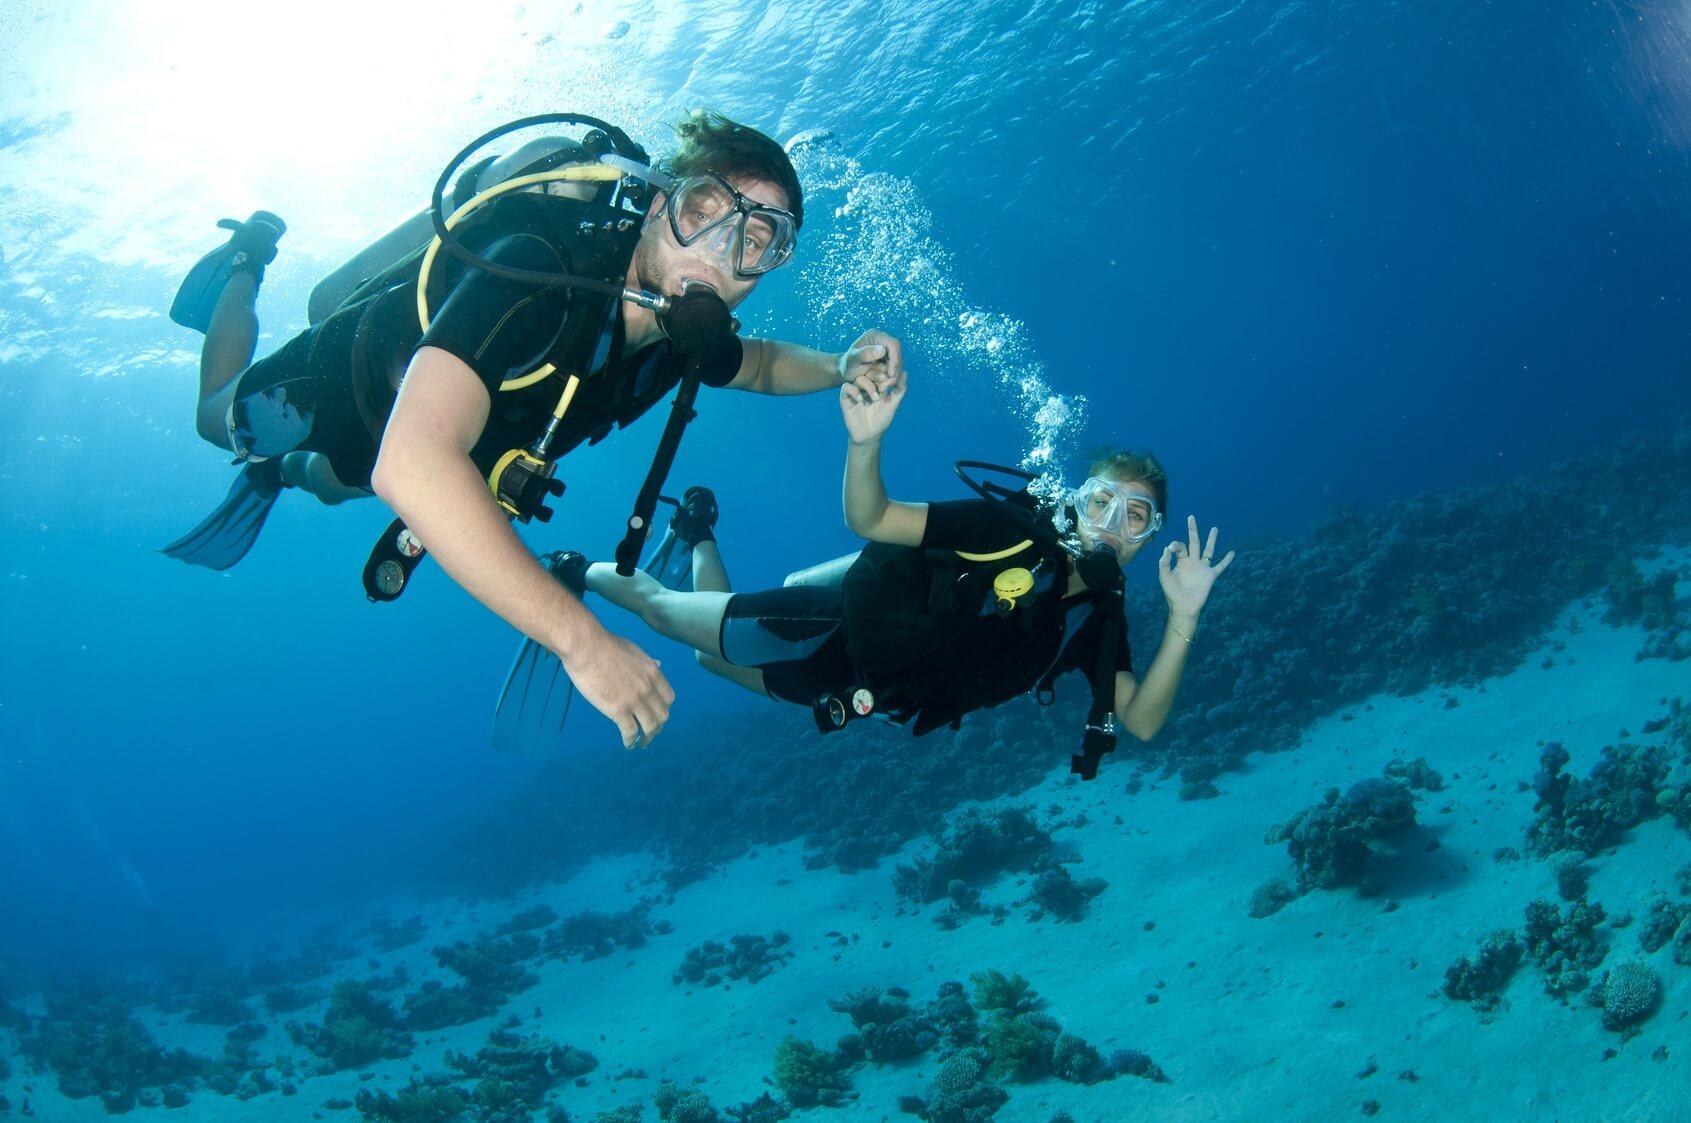 Aventuras acuáticas